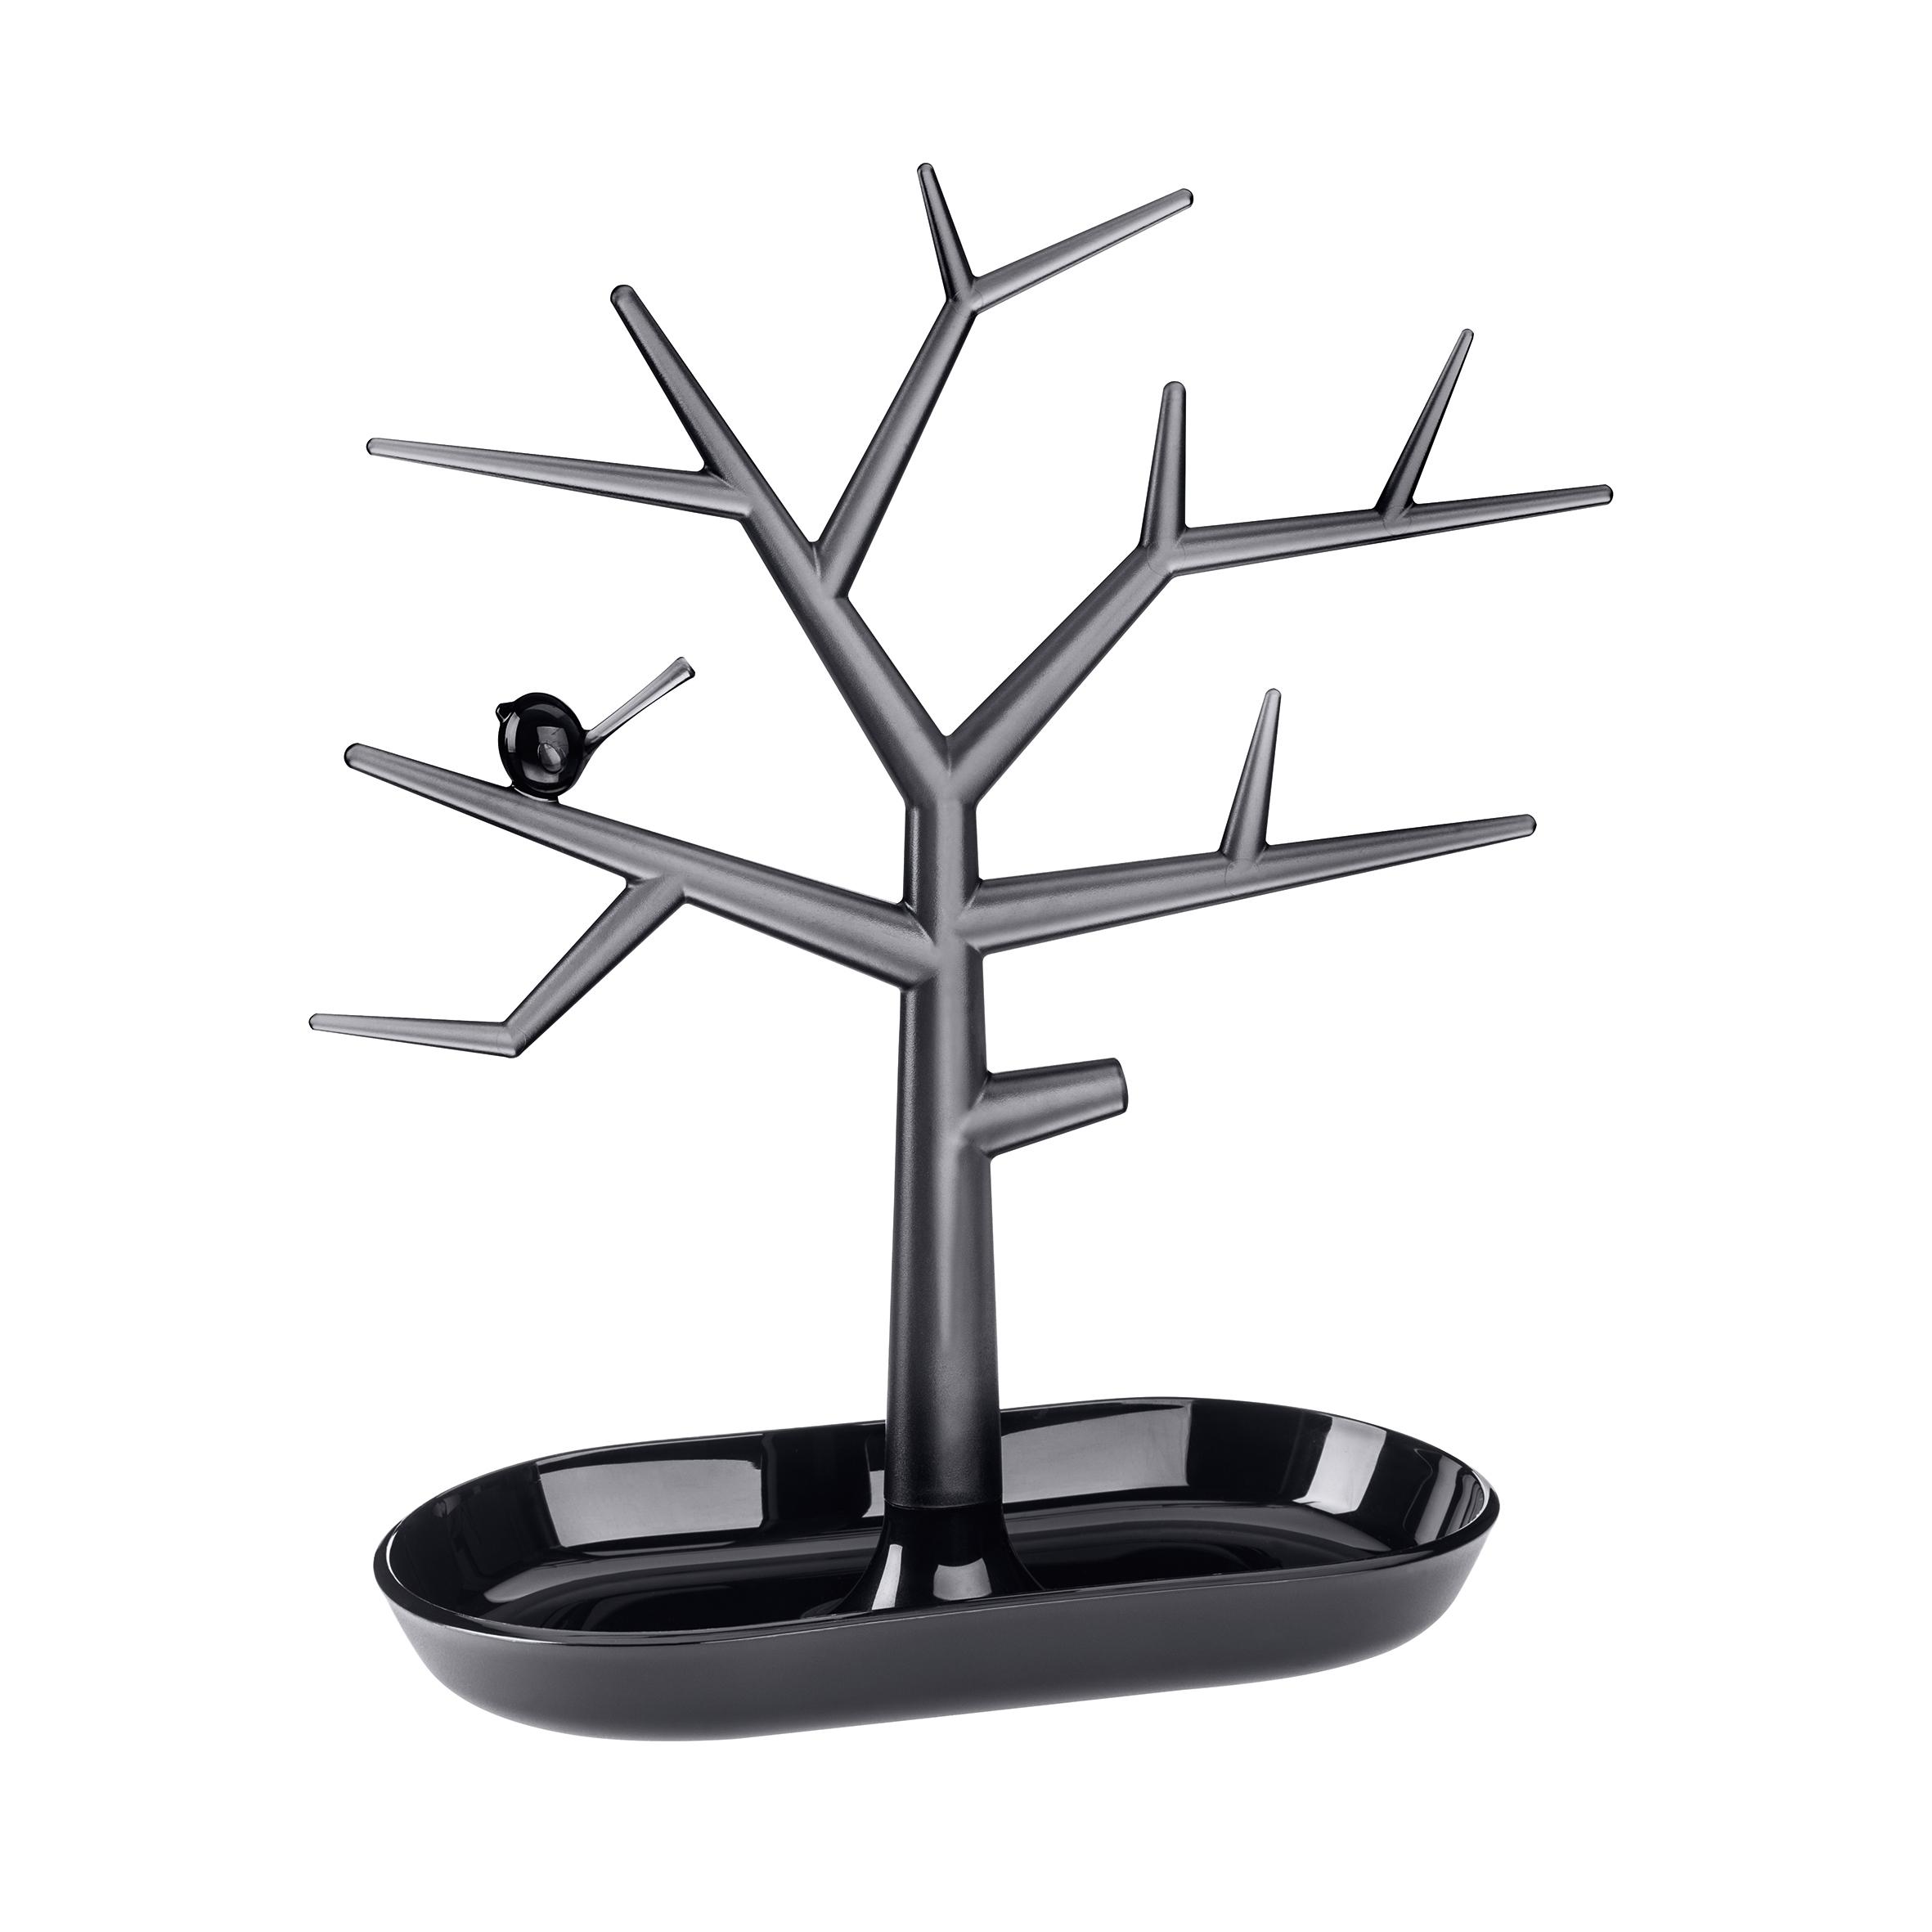 Suport pentru bijuterii din termoplastic Trinket Tree Negru, l27,3xA12,8xH30,6 cm